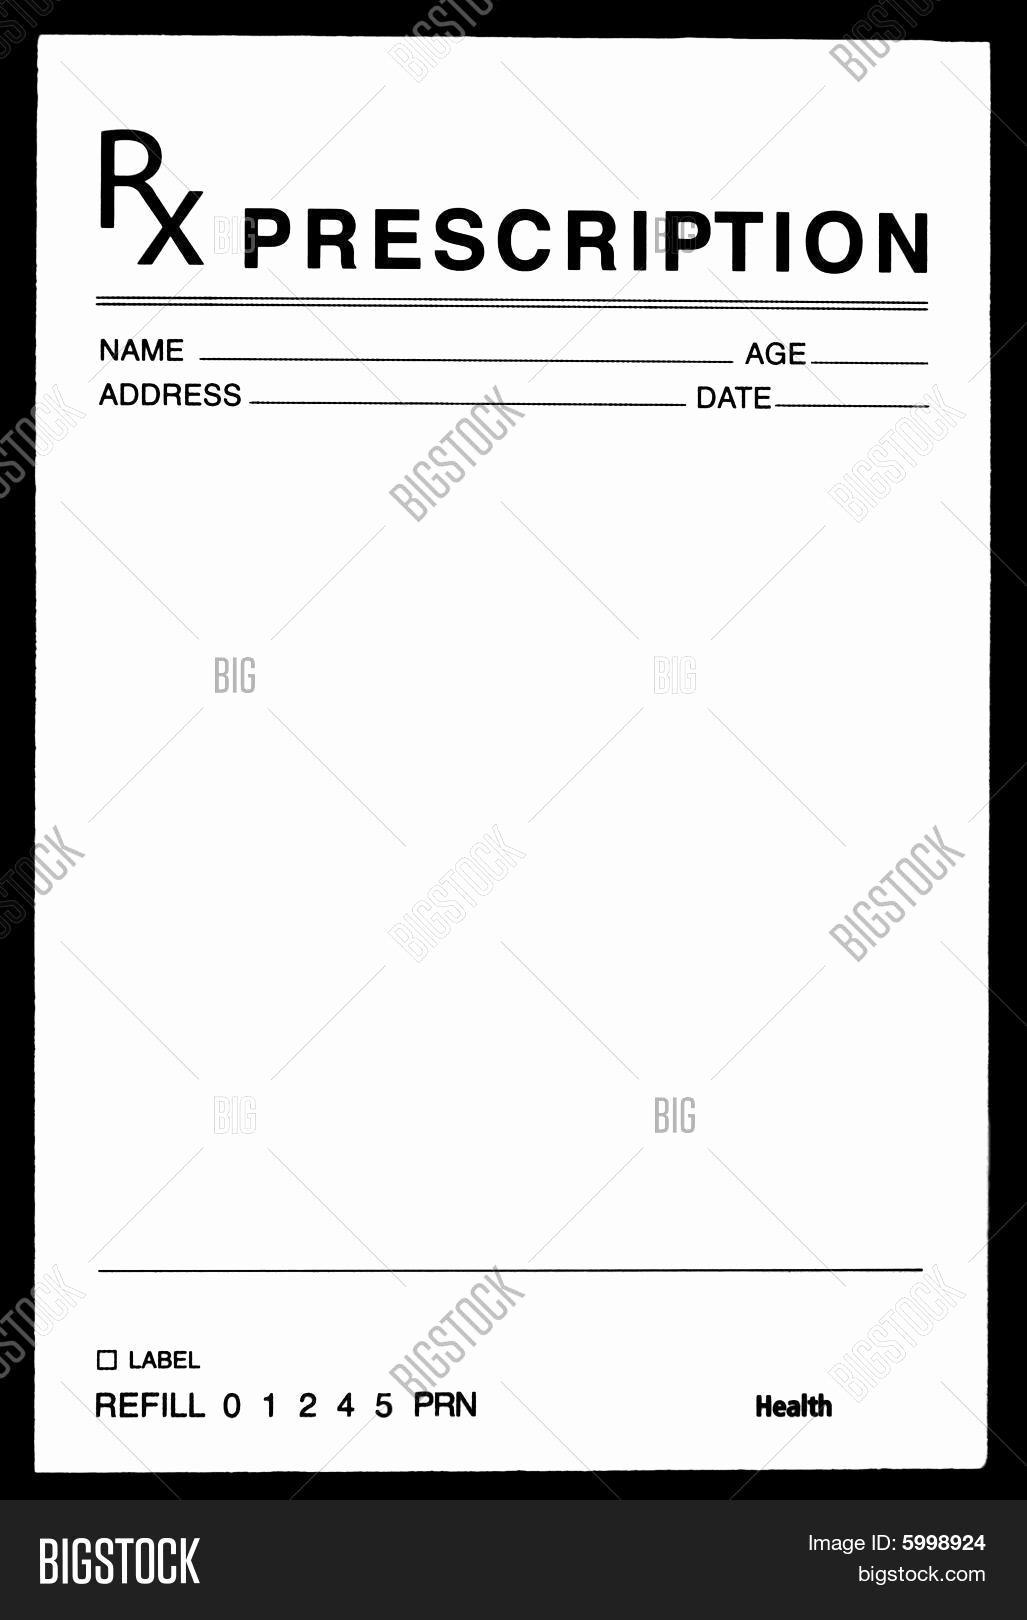 Blank Prescription Pad Template Beautiful Blank Prescription form Image Cg5p C